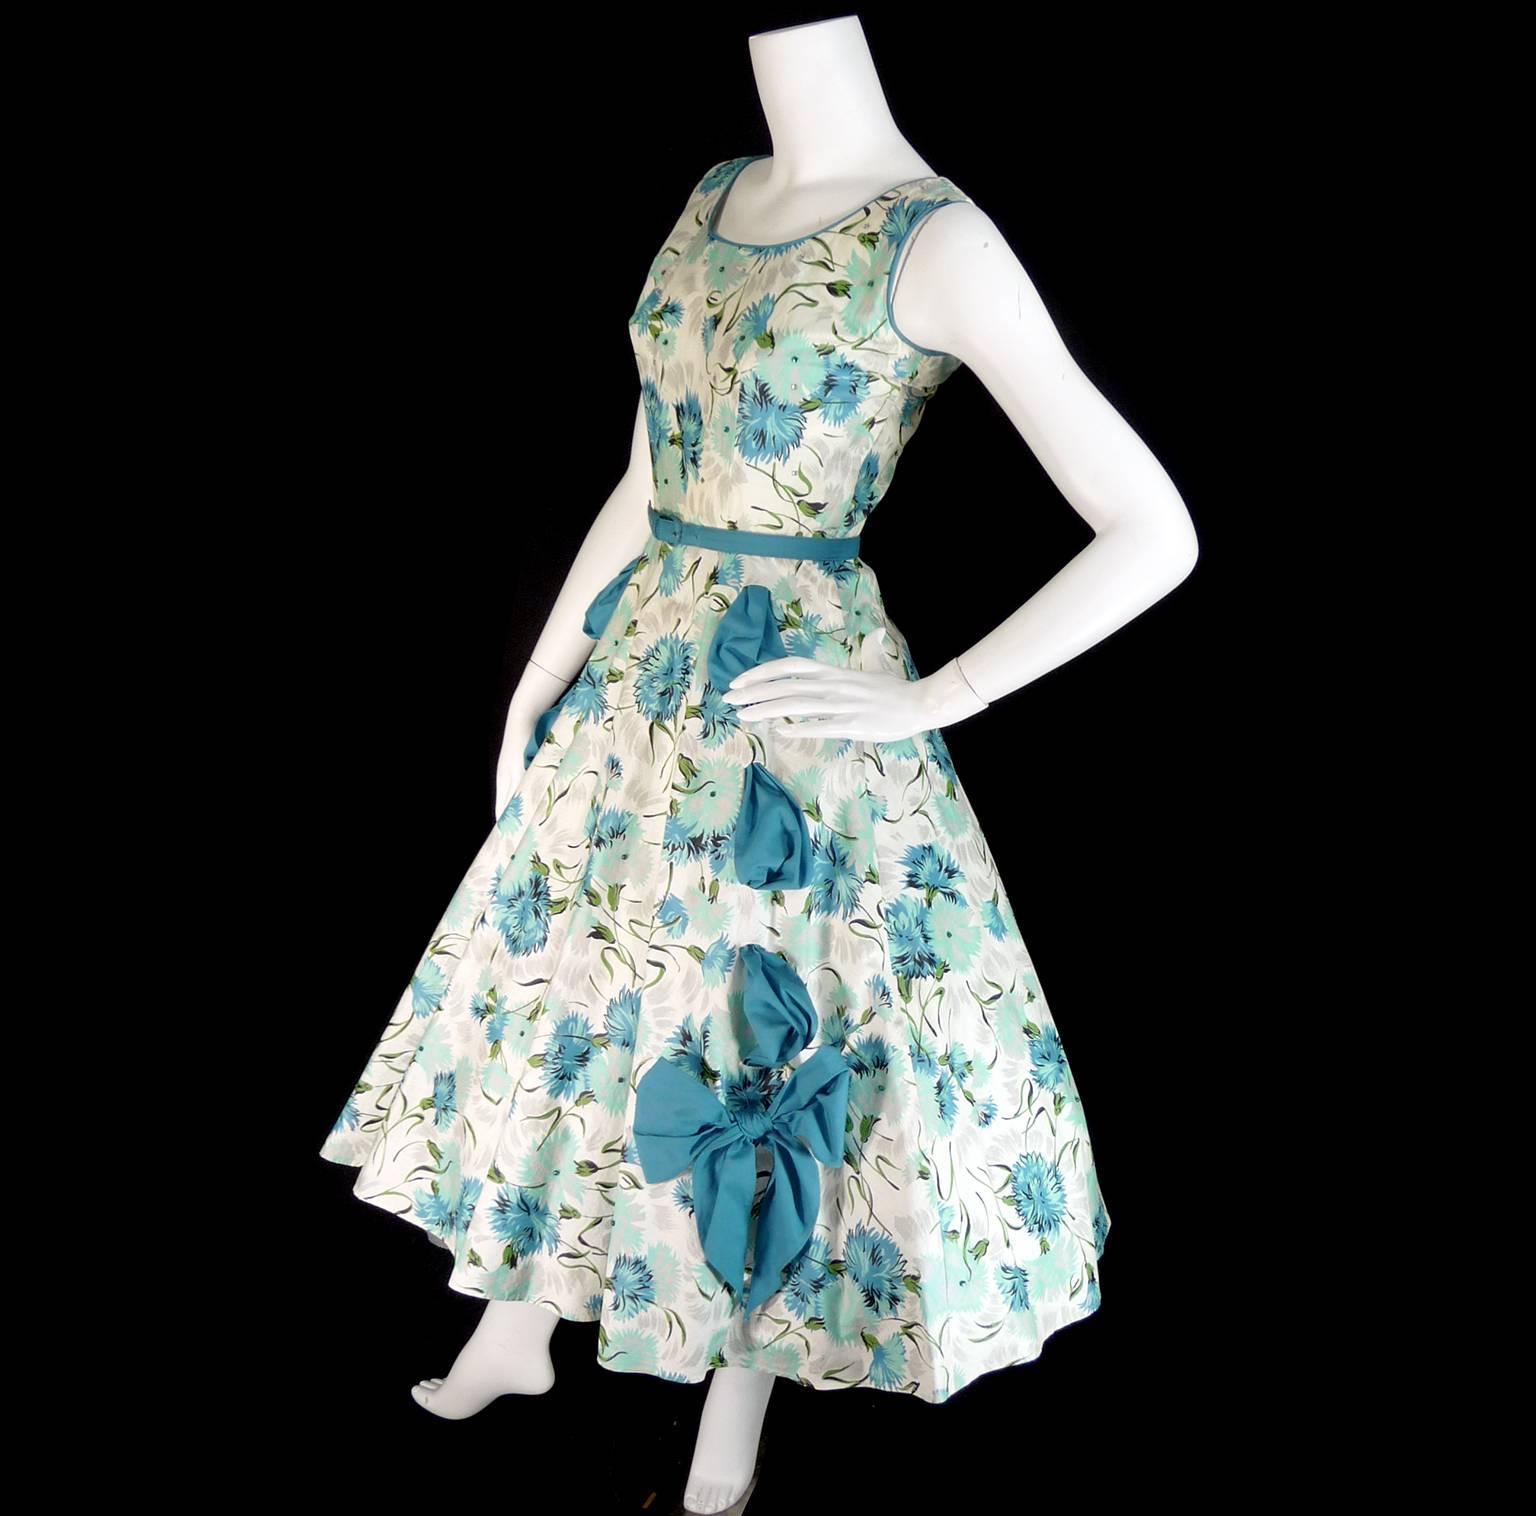 1950s Blue Floral Vintage Dress Rhinestones Bows 50s Full Skirt Size ...